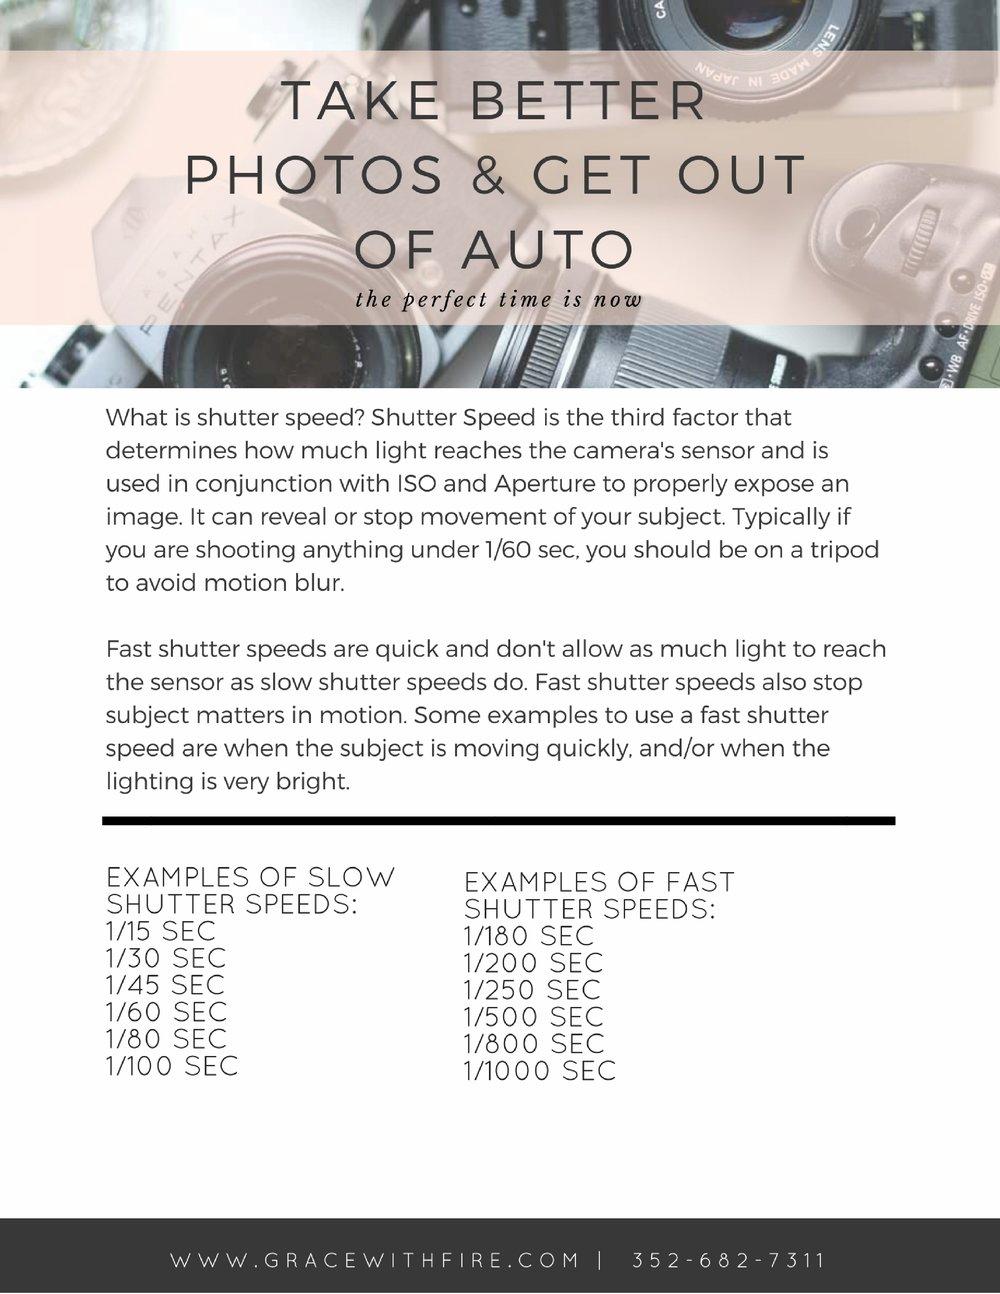 shutter-speed-camera-photography-orlando-learn-blog.jpg